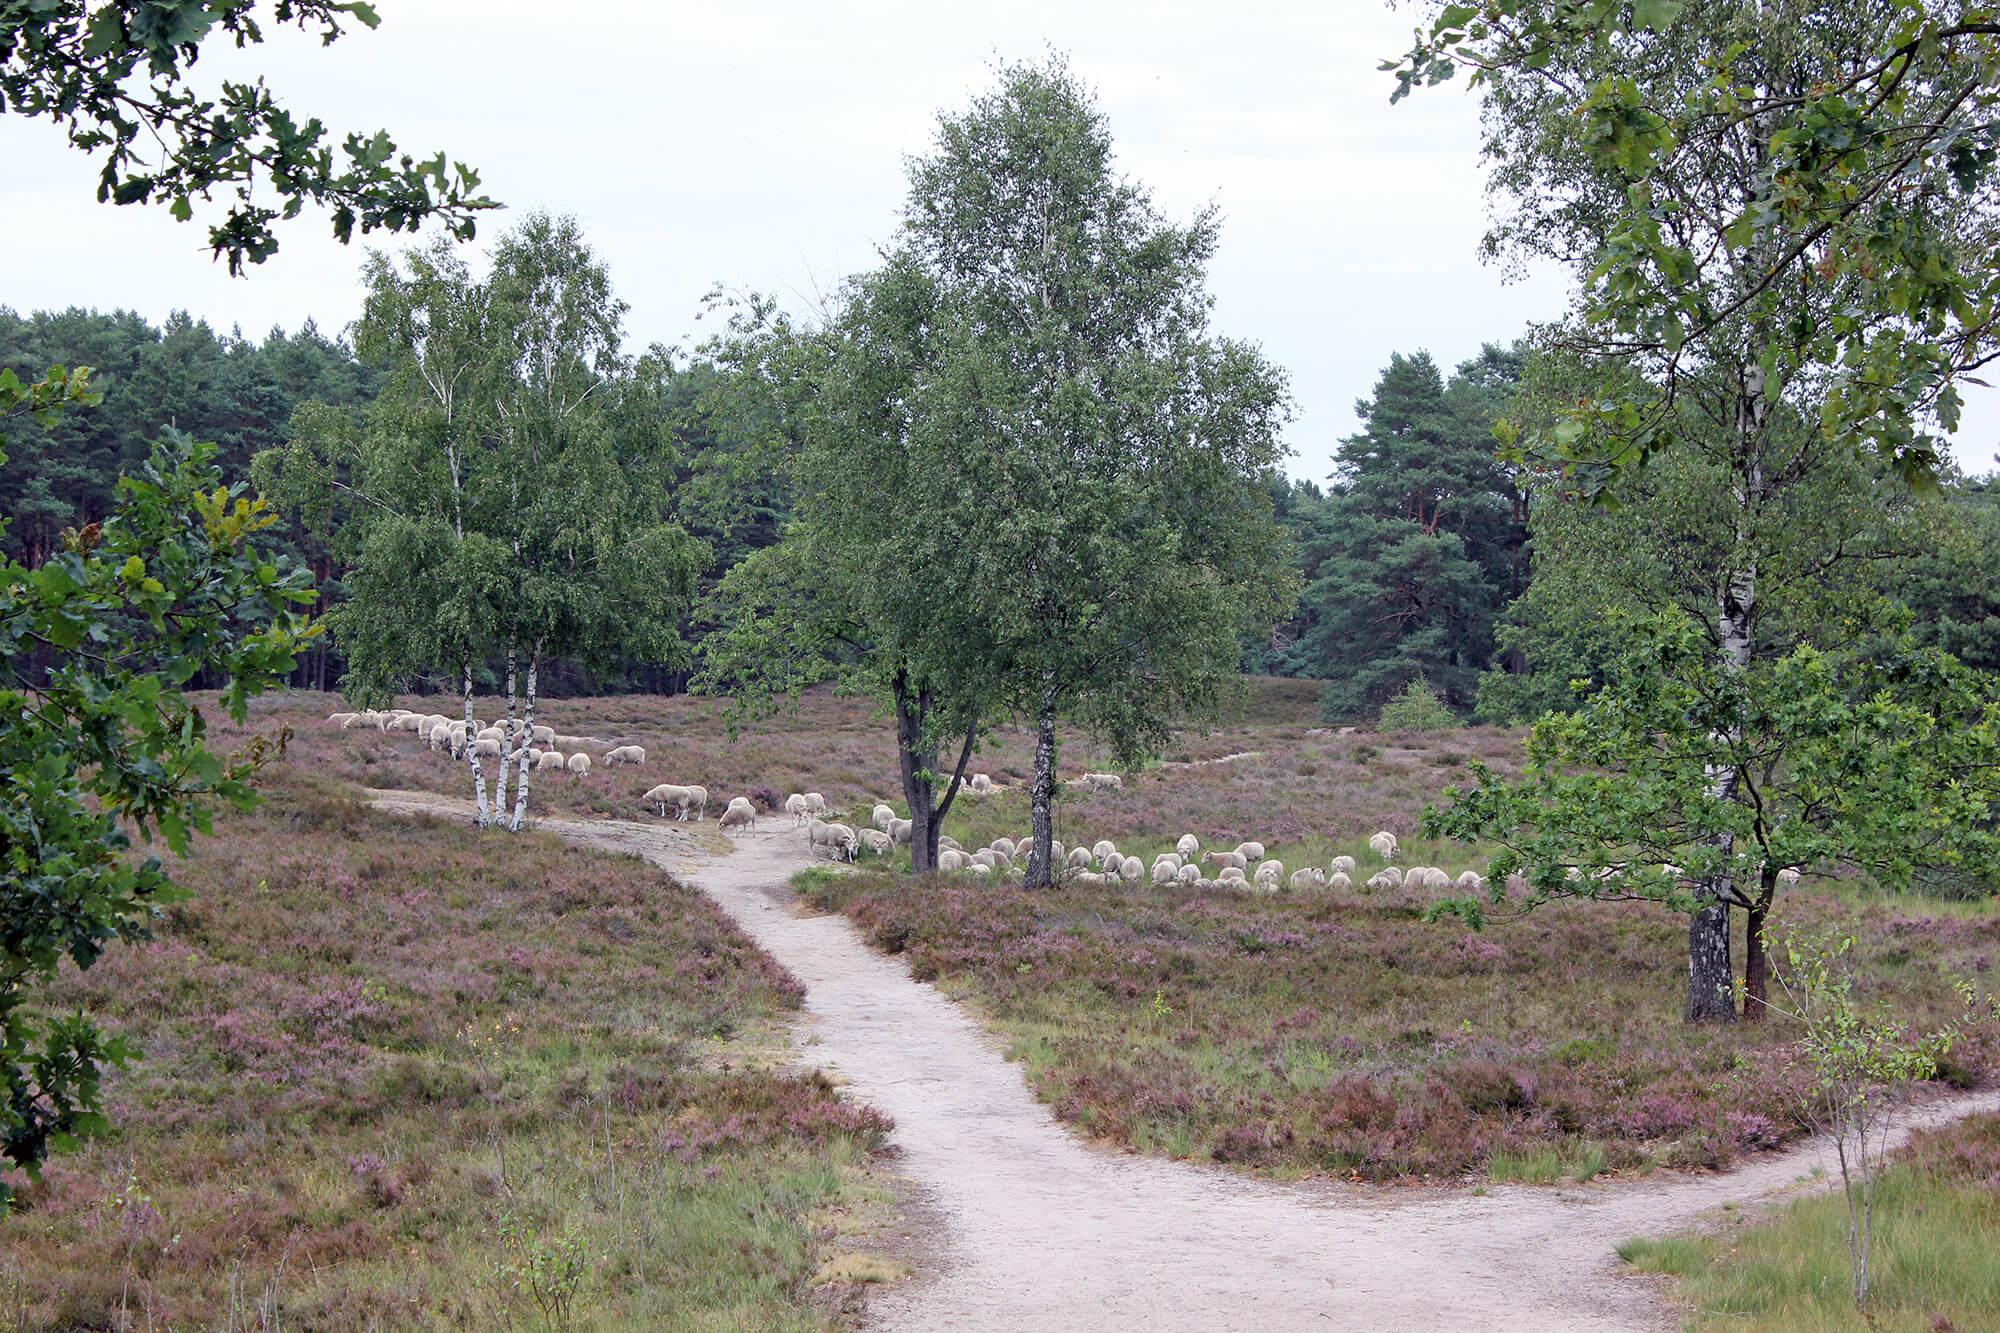 Heidschnuckenherde Gifhorner Heide